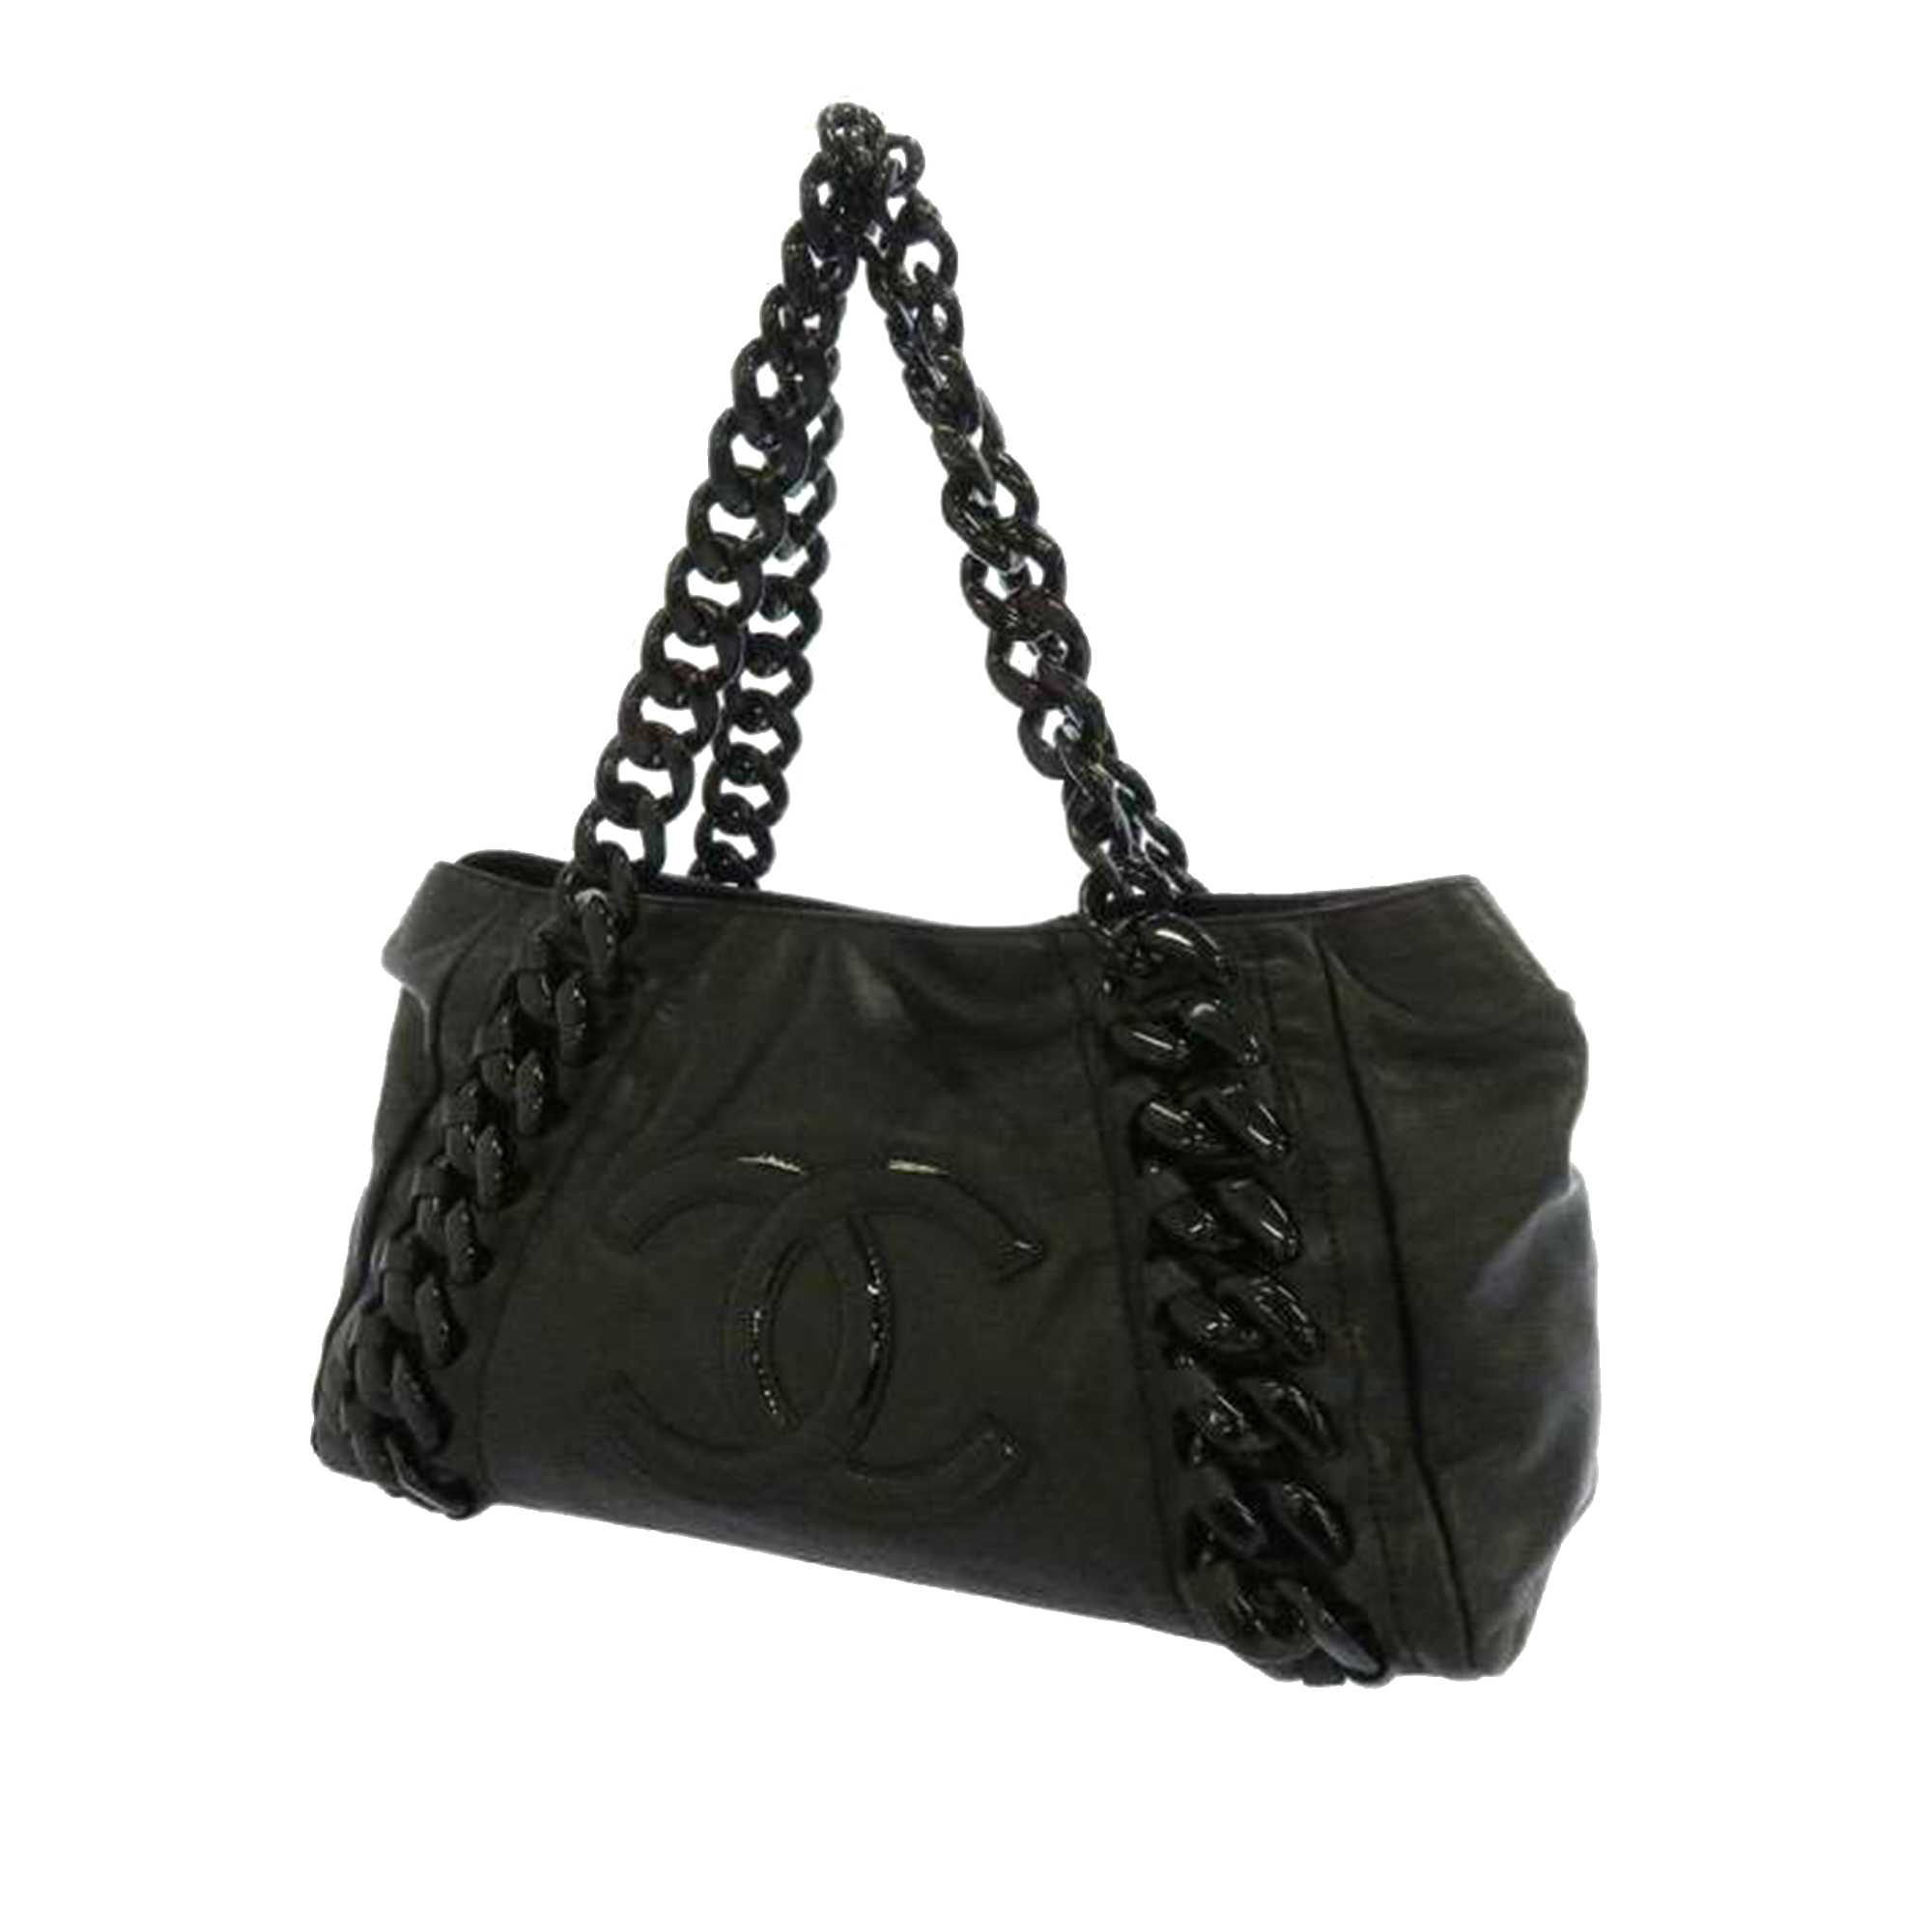 Chanel CC Leather Chain Shoulder Bag